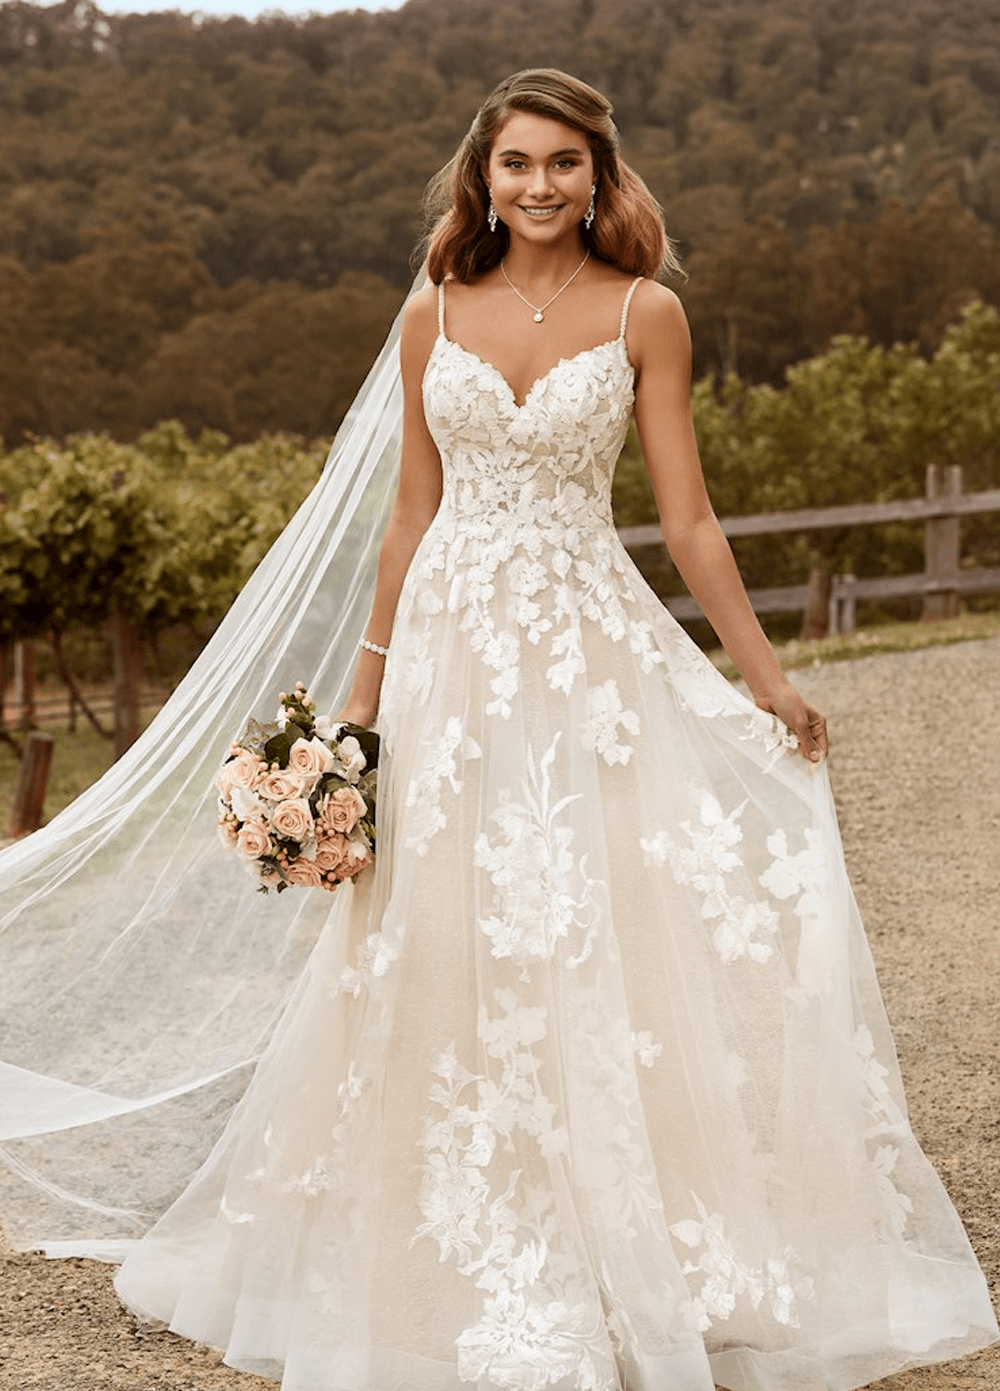 Nikiti Wedding Dress from the Sophia Tolli 2021 collection